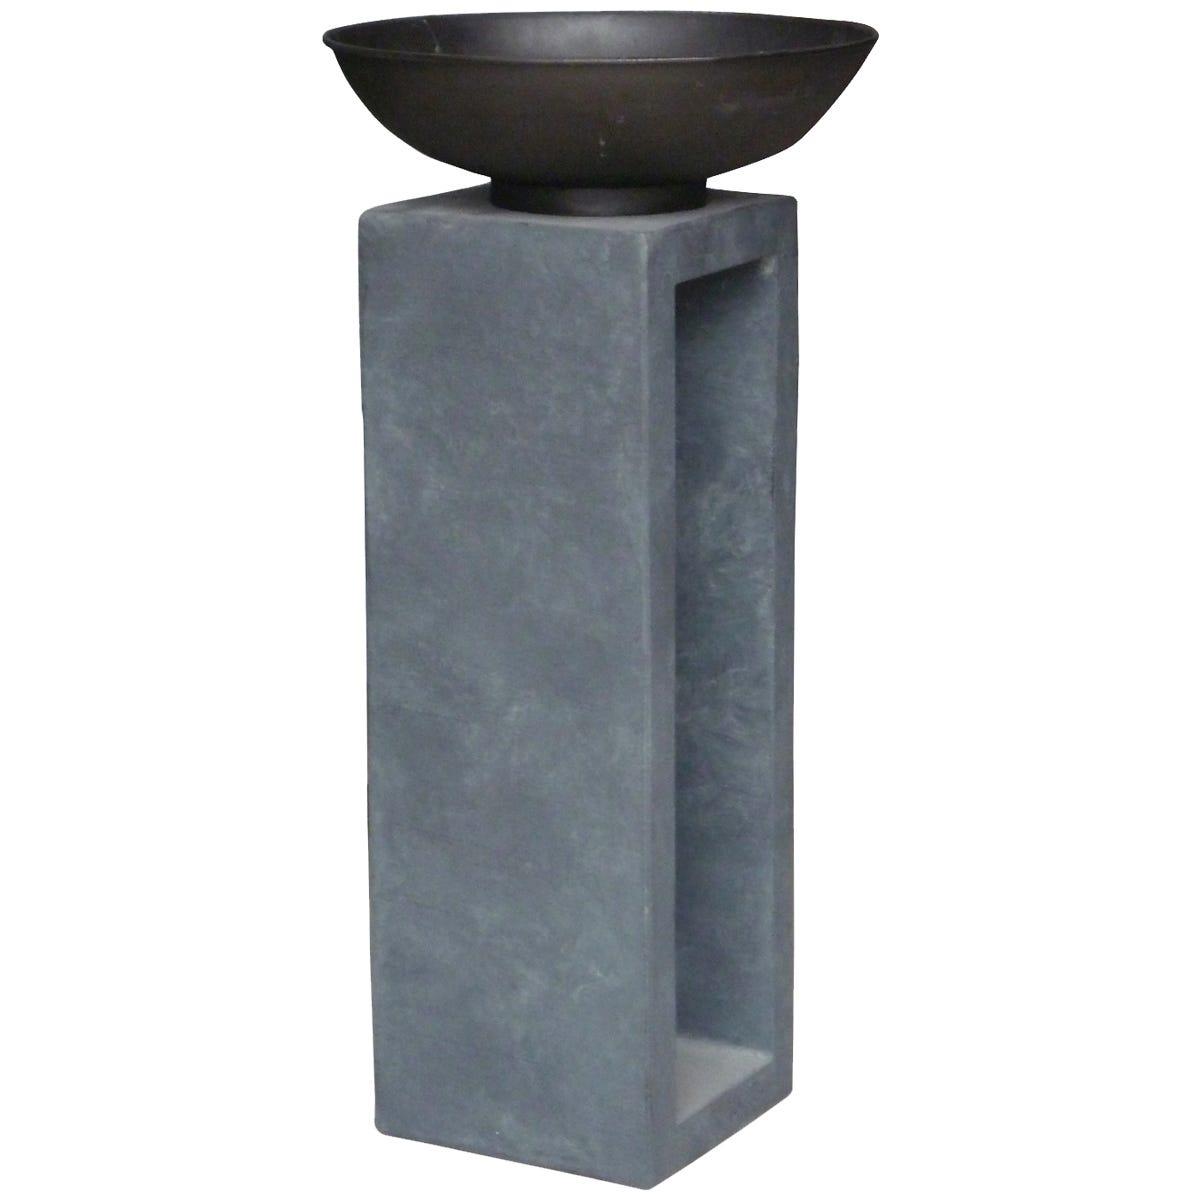 Charles Bentley Metal Fire Bowl - Large